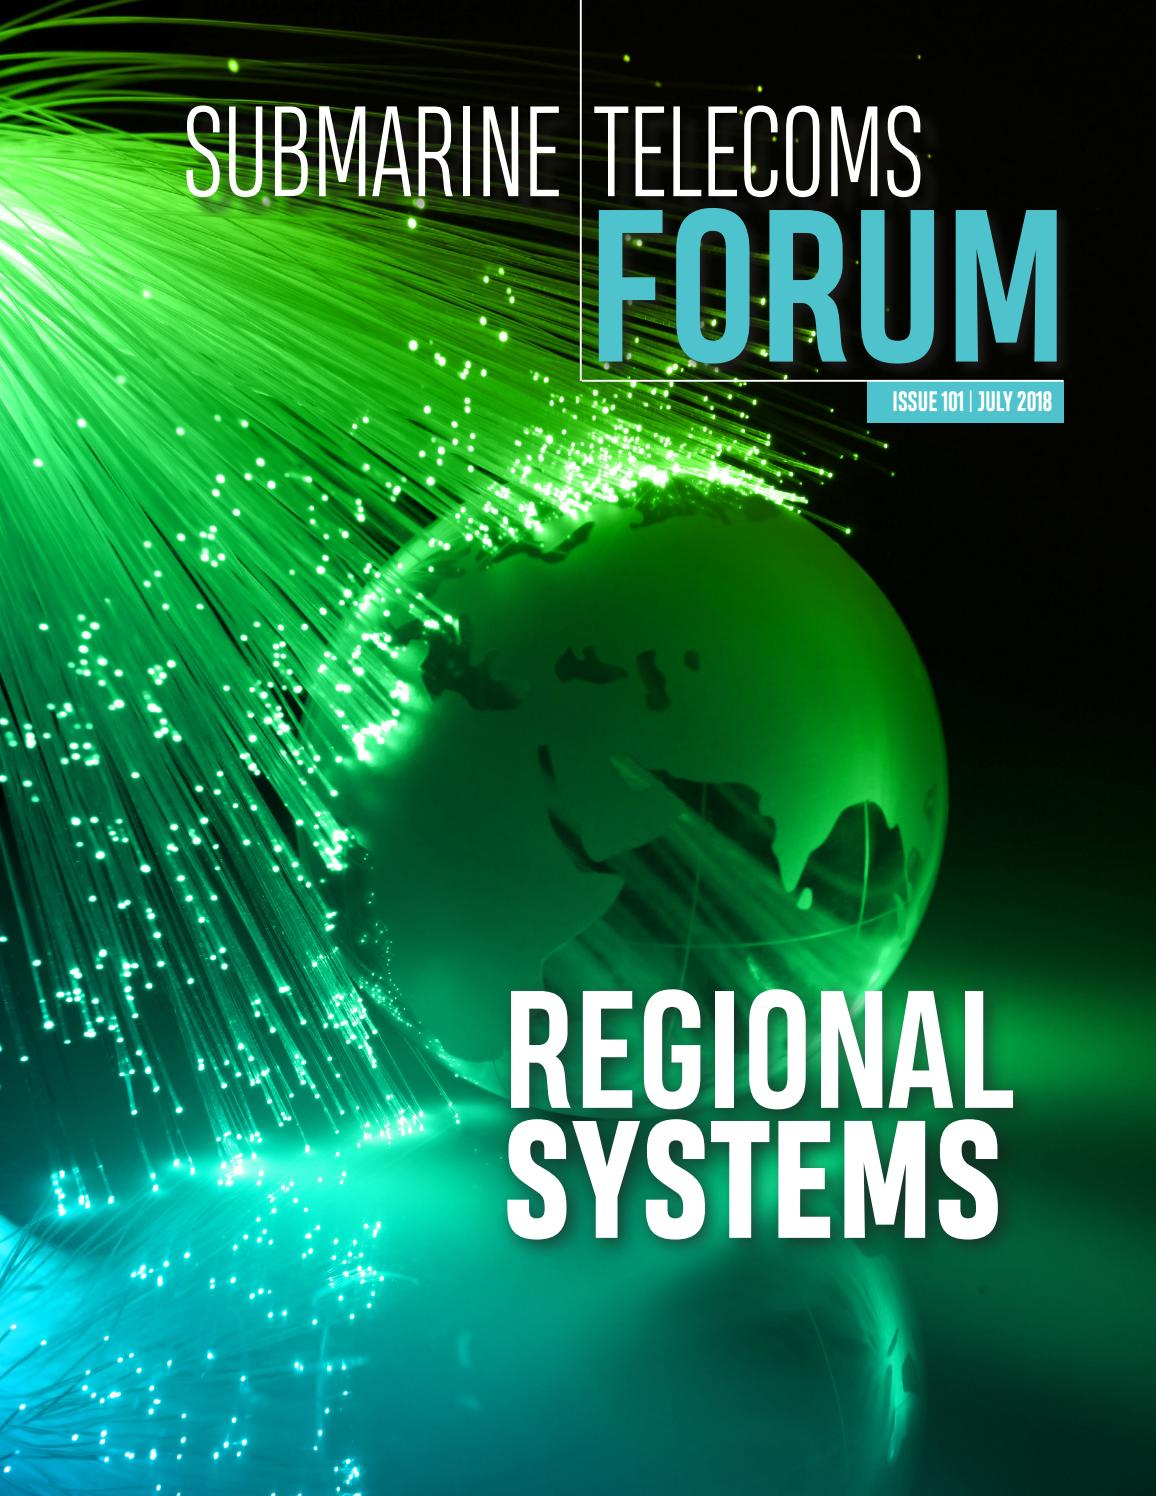 Subtel Forum Magazine 101 Regional Systems By Submarine Clark Gcx 25e Wiring Diagram Telelecoms Issuu